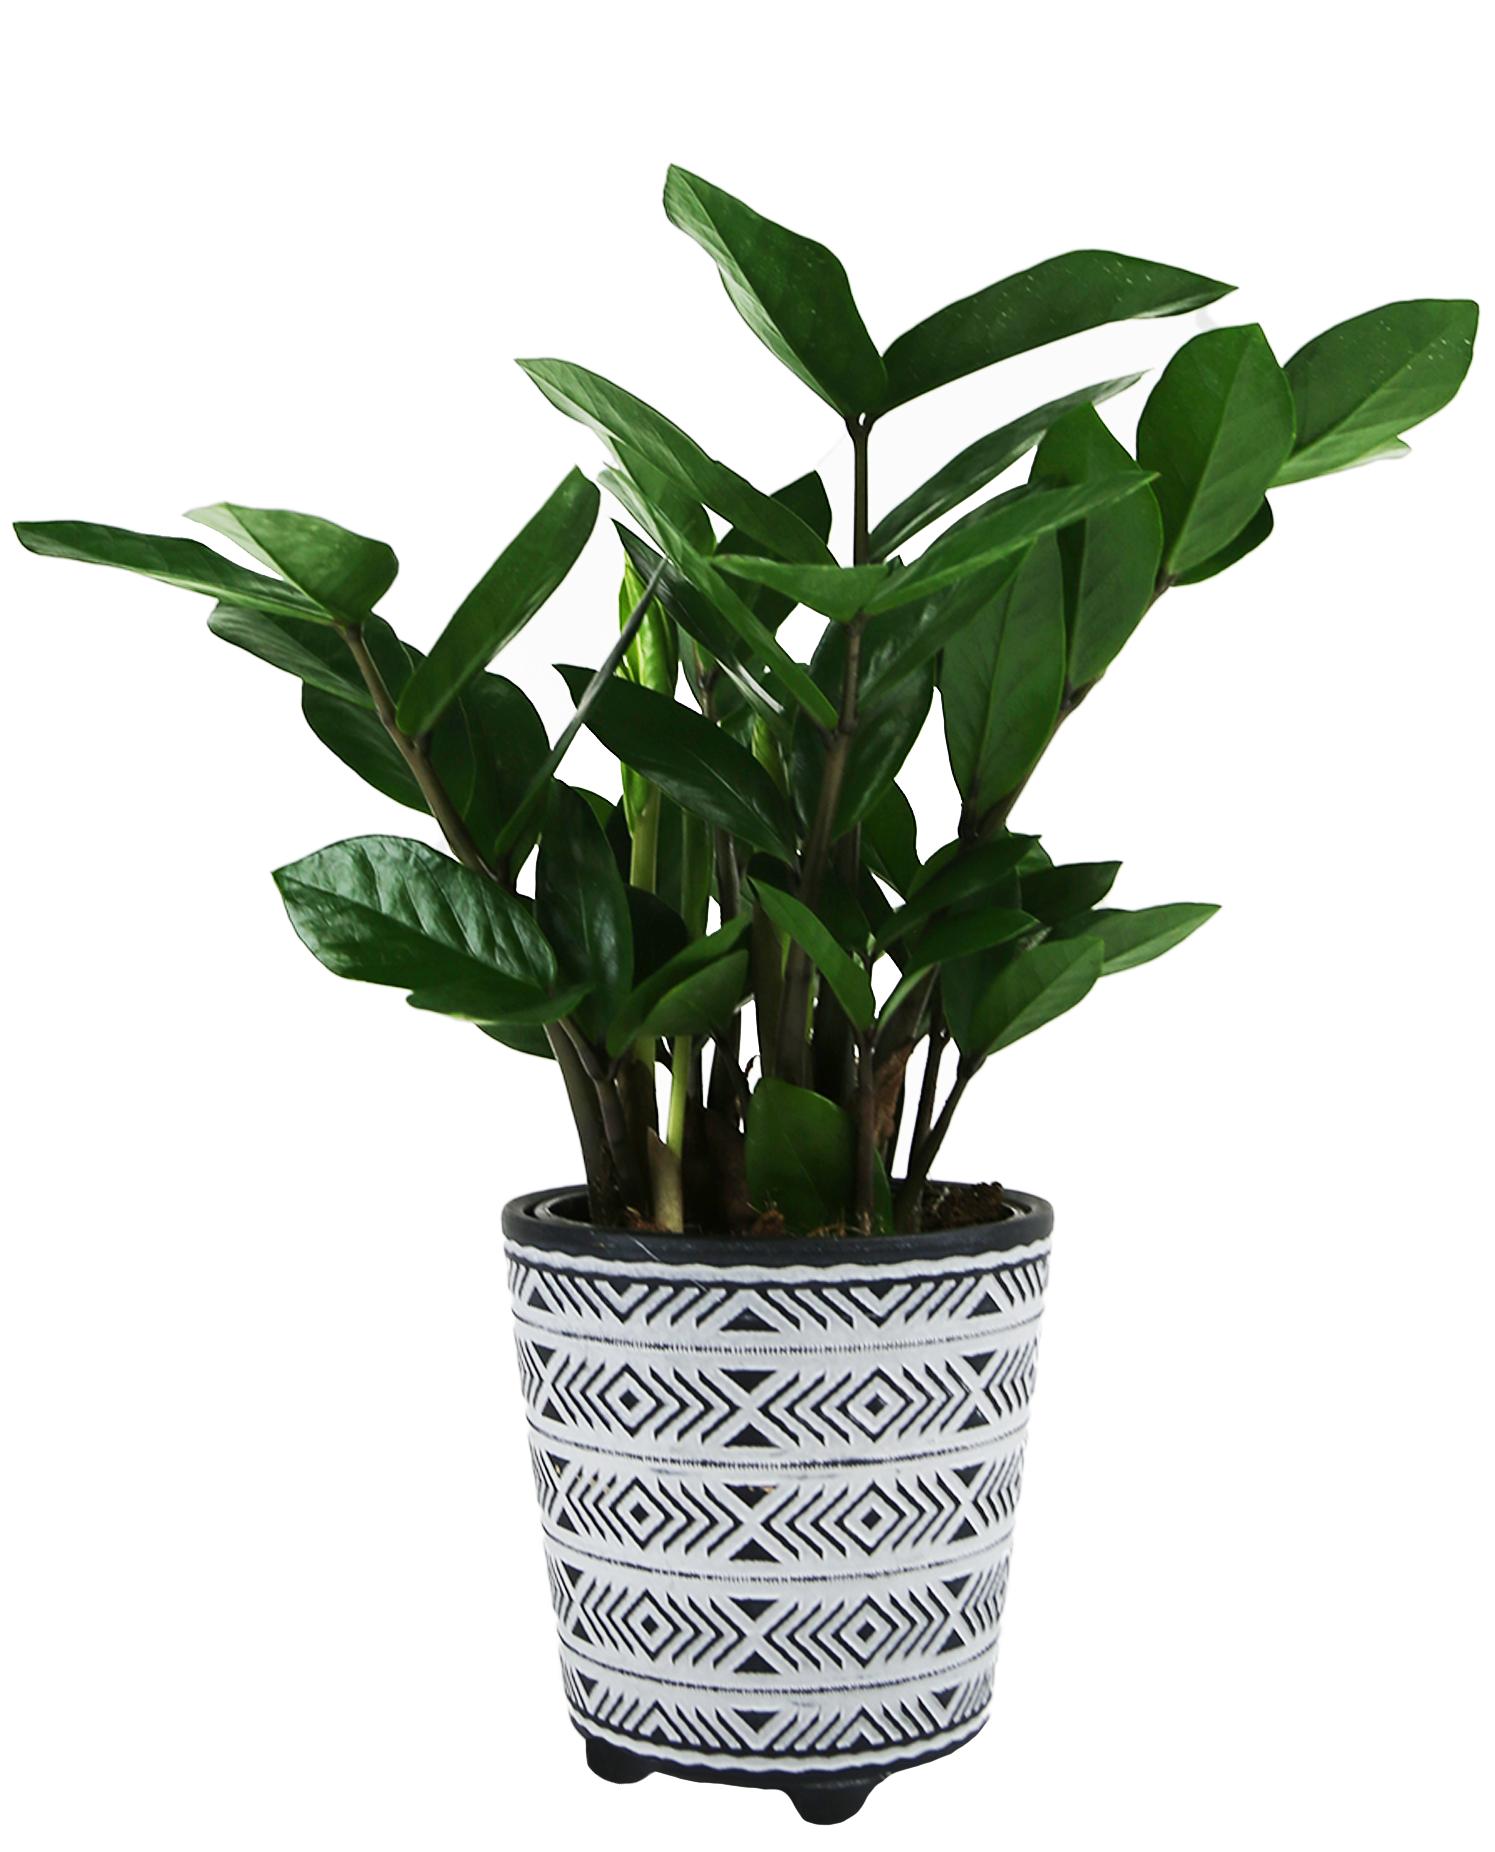 Miles Arrow Feet 5in_ZZ Plant Select Foliage